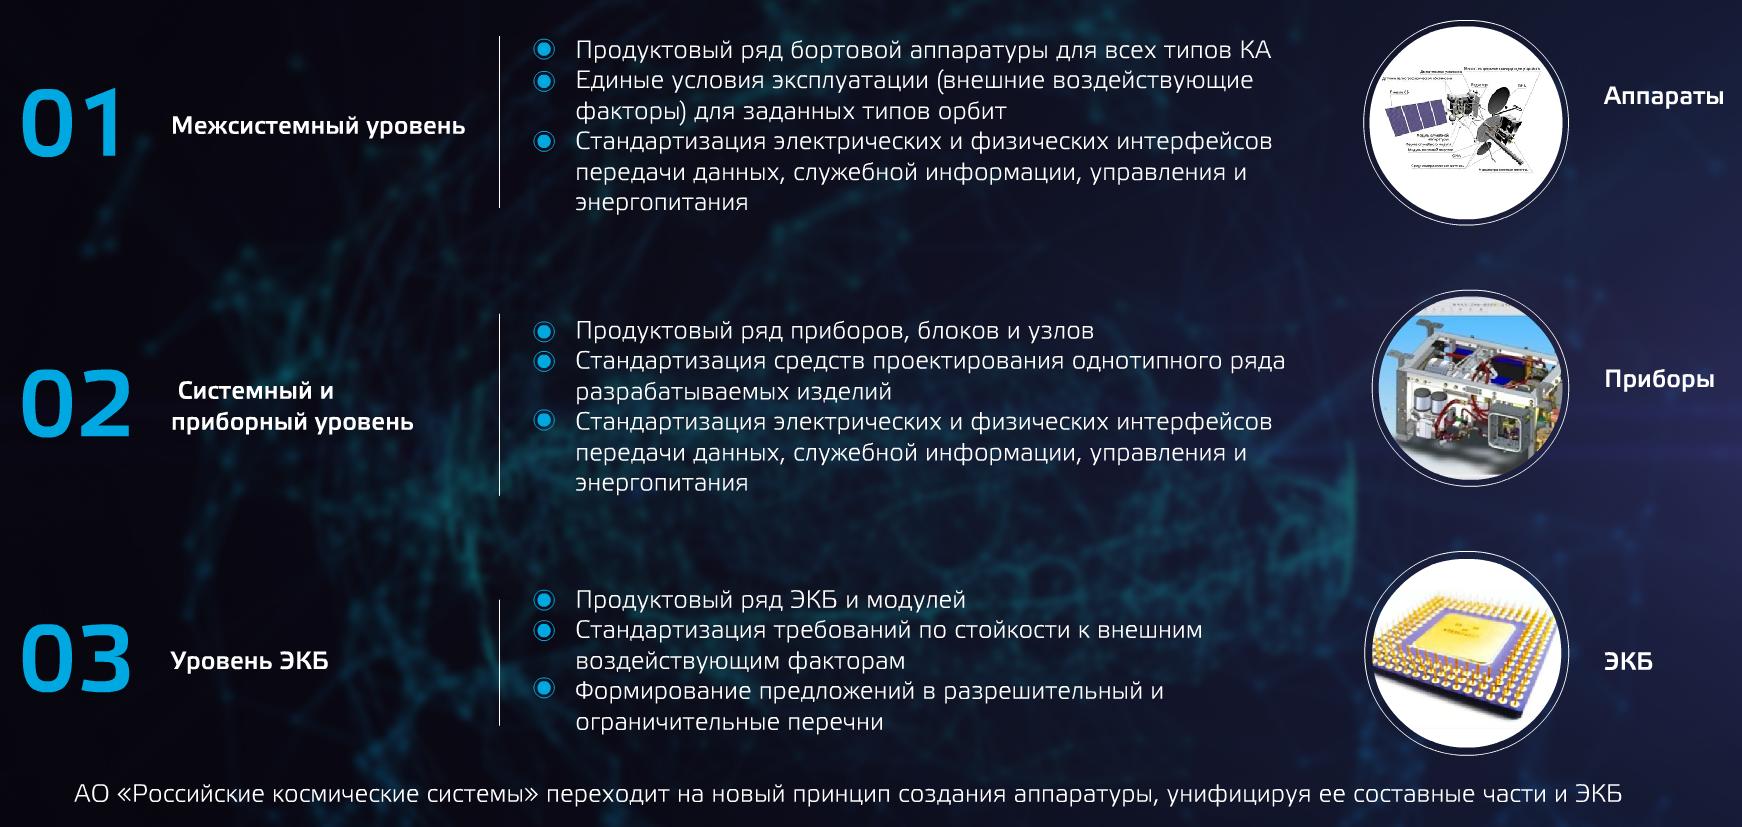 4web_новый_принцып_создания_аппаратуры